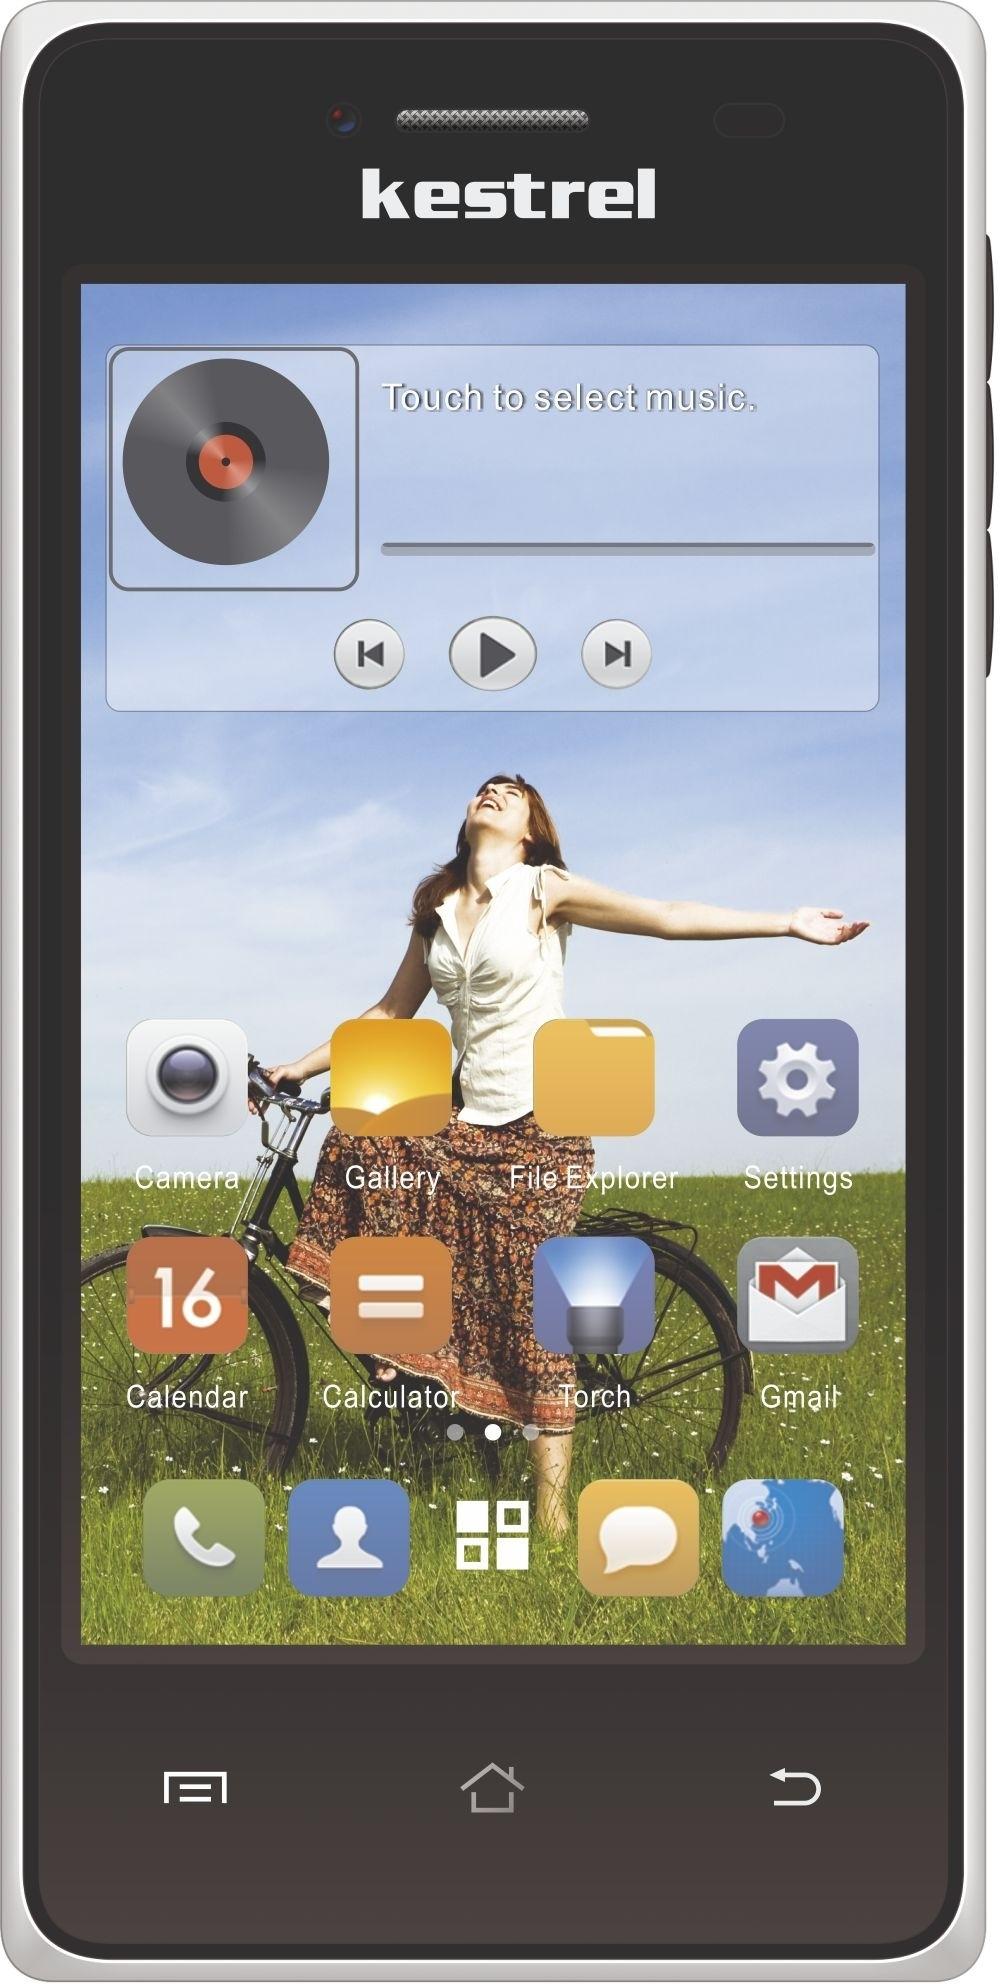 Kestrel KM 401 (White, 4 GB)(512 MB RAM)